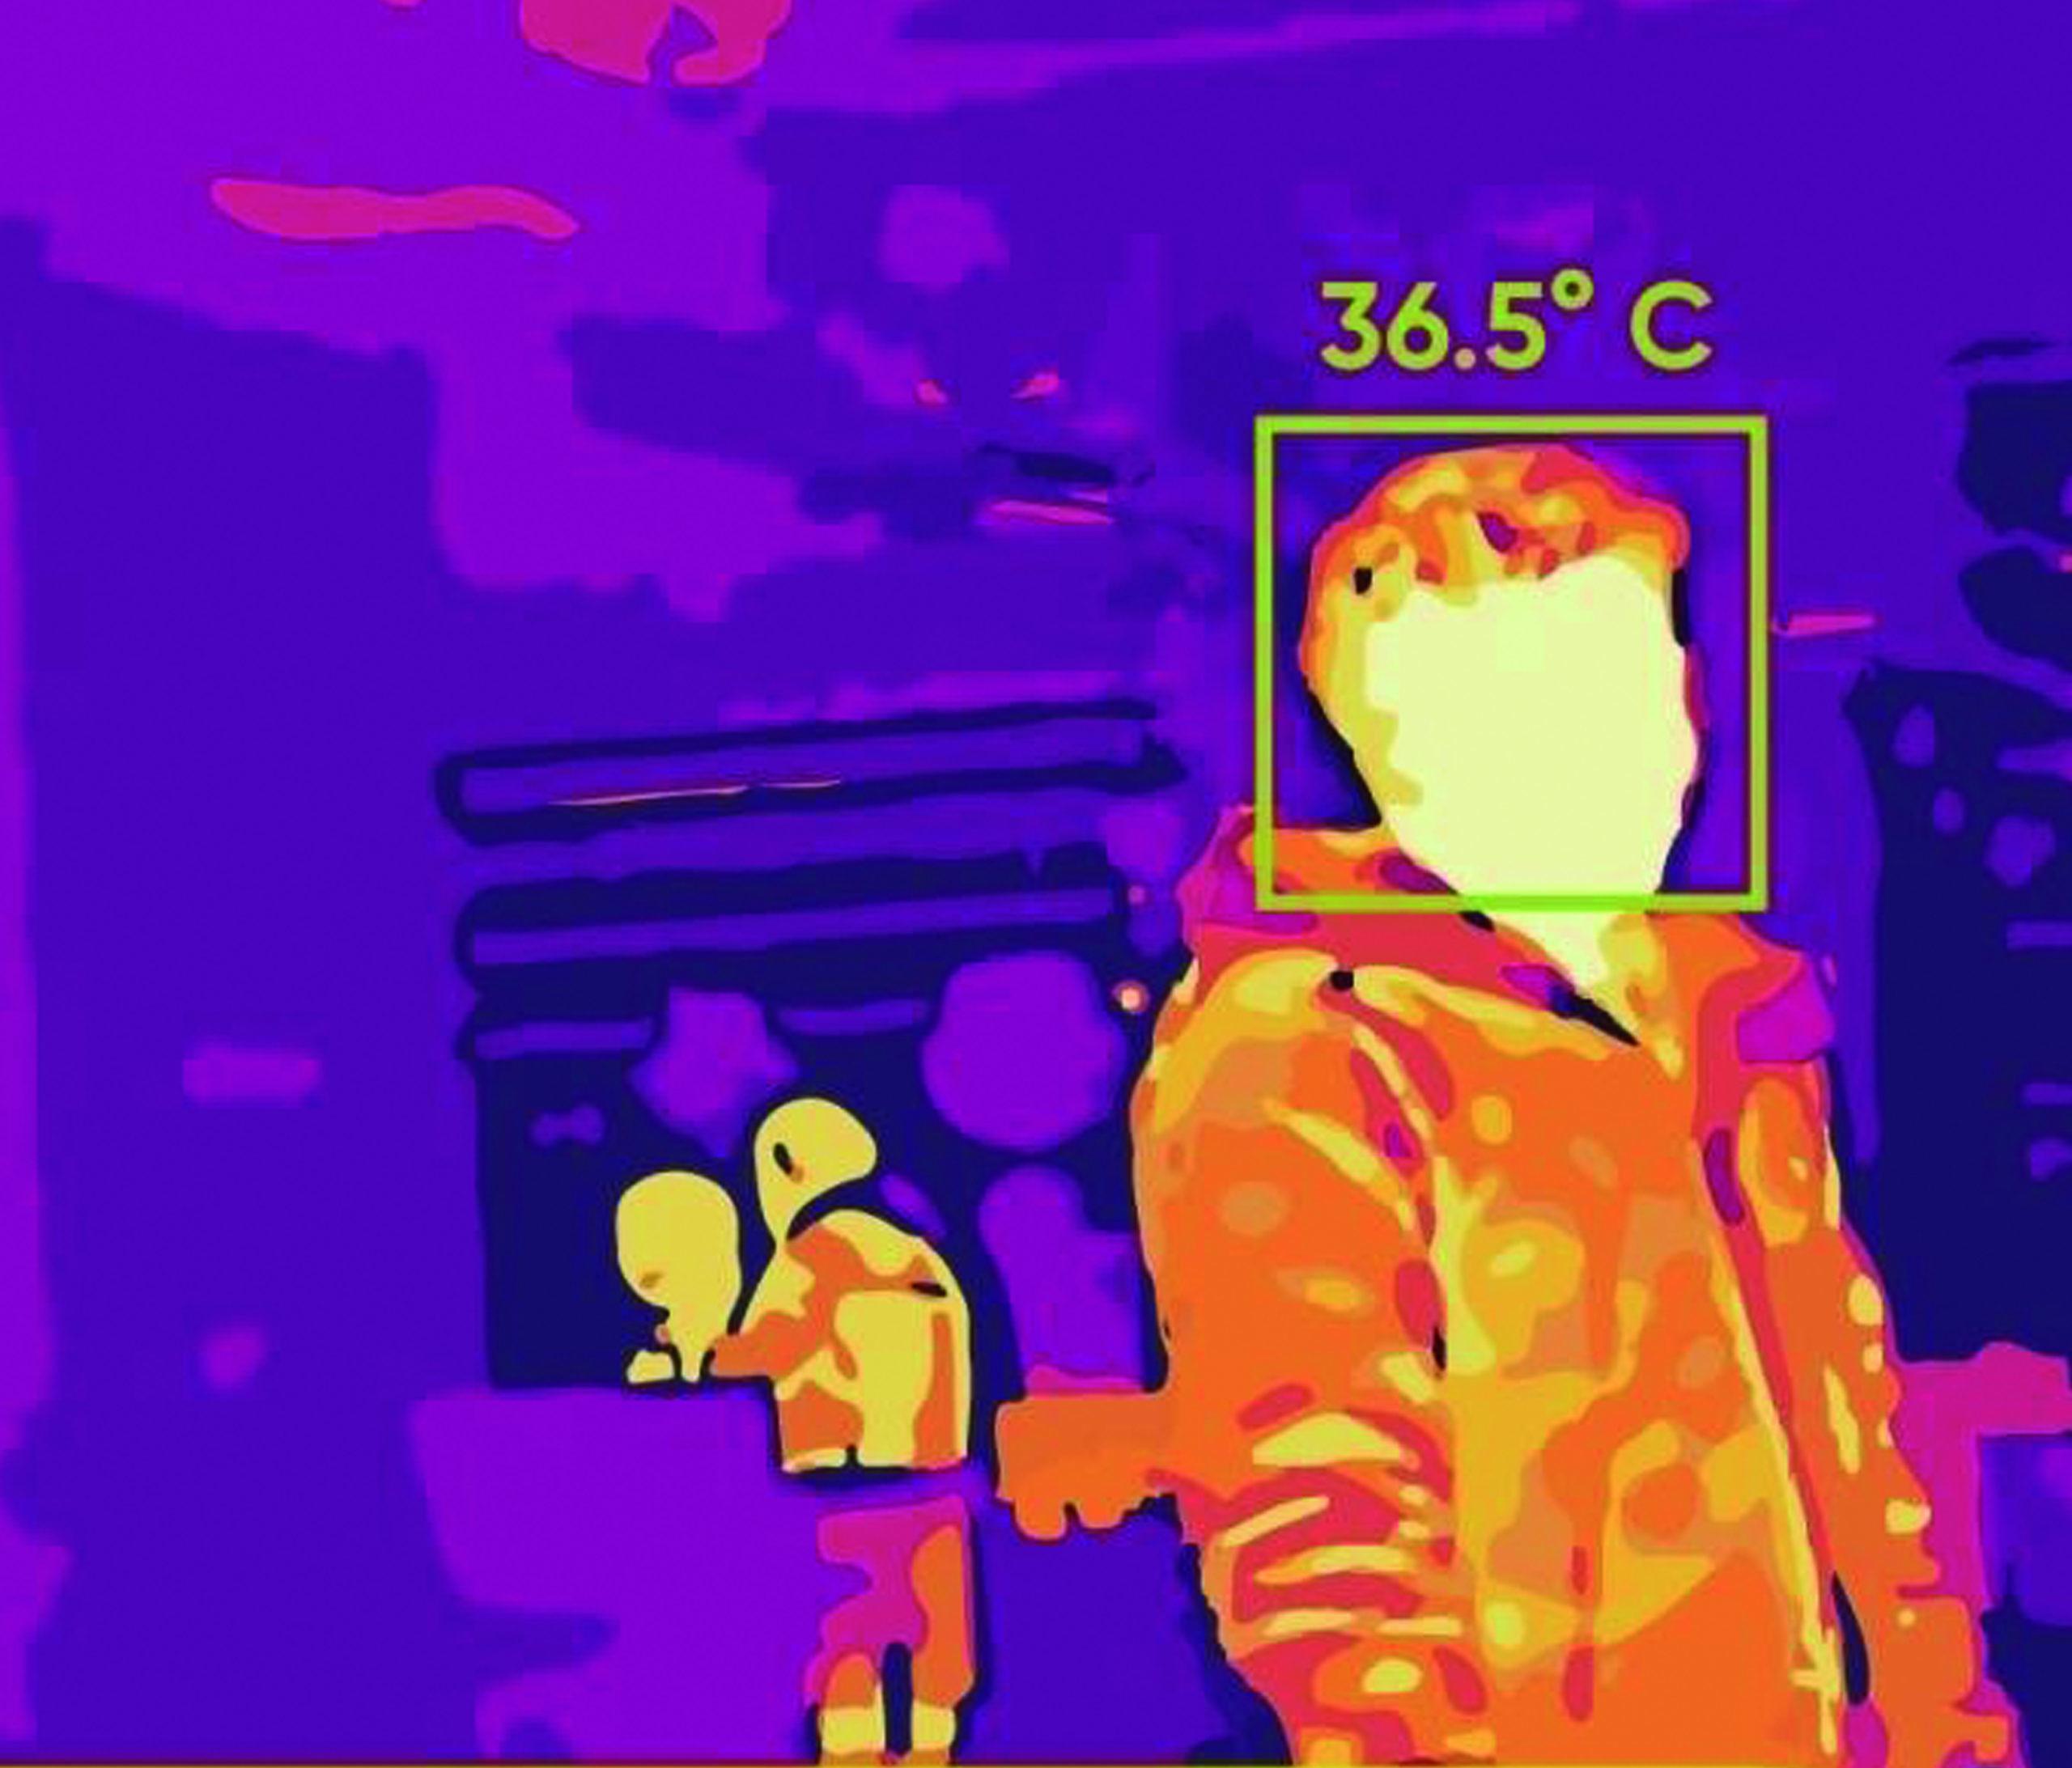 Imagen de cámara termográfica